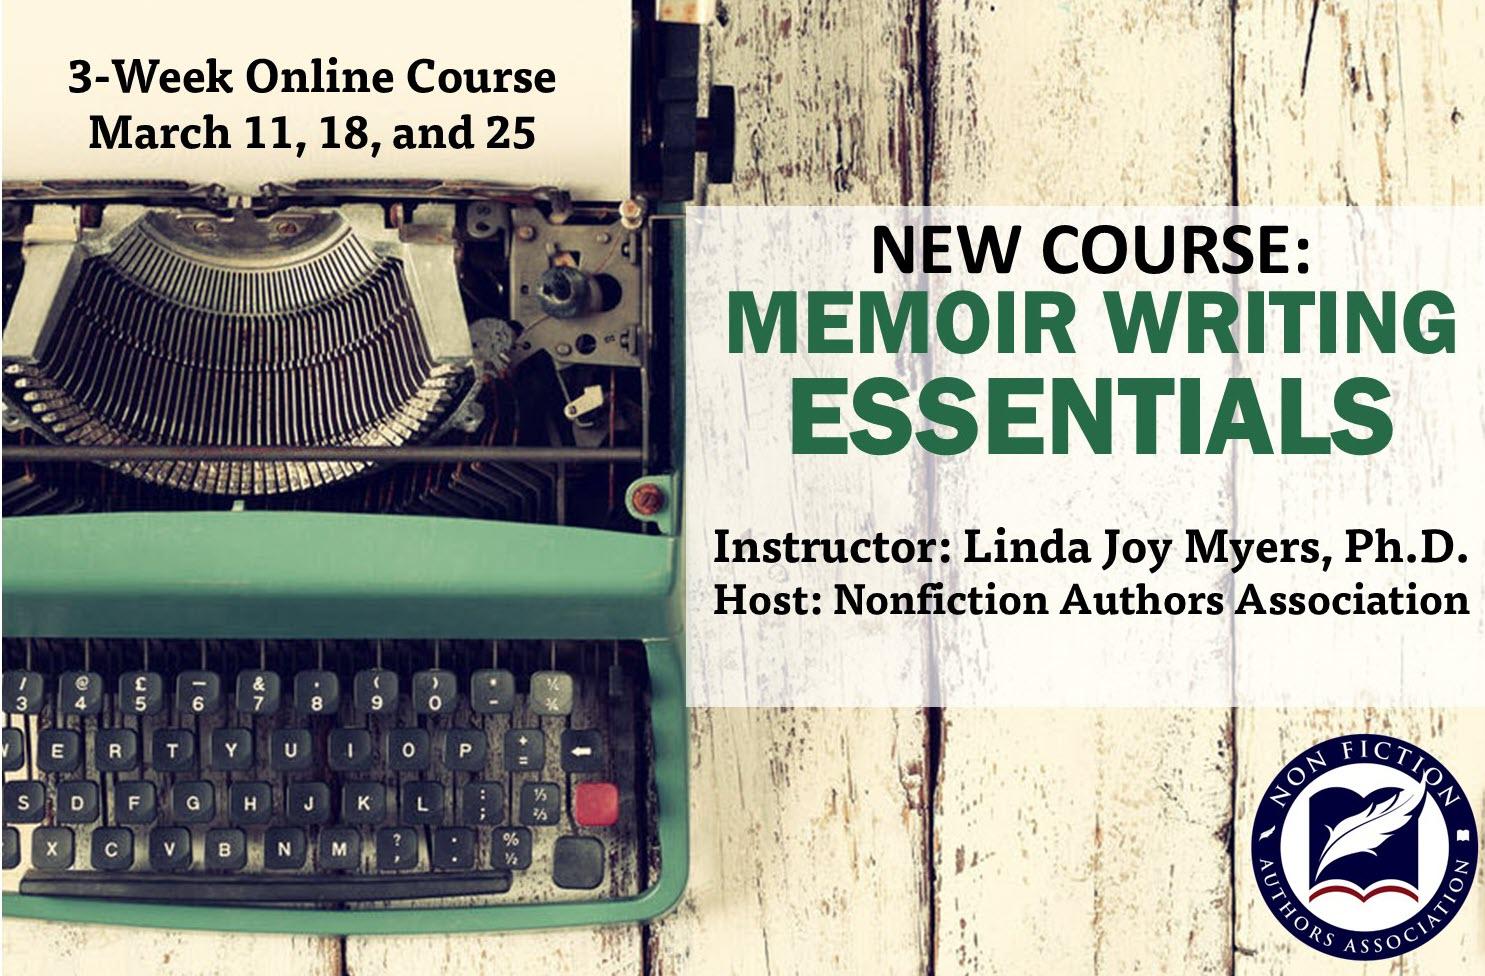 Memoir Writing Essentials Course